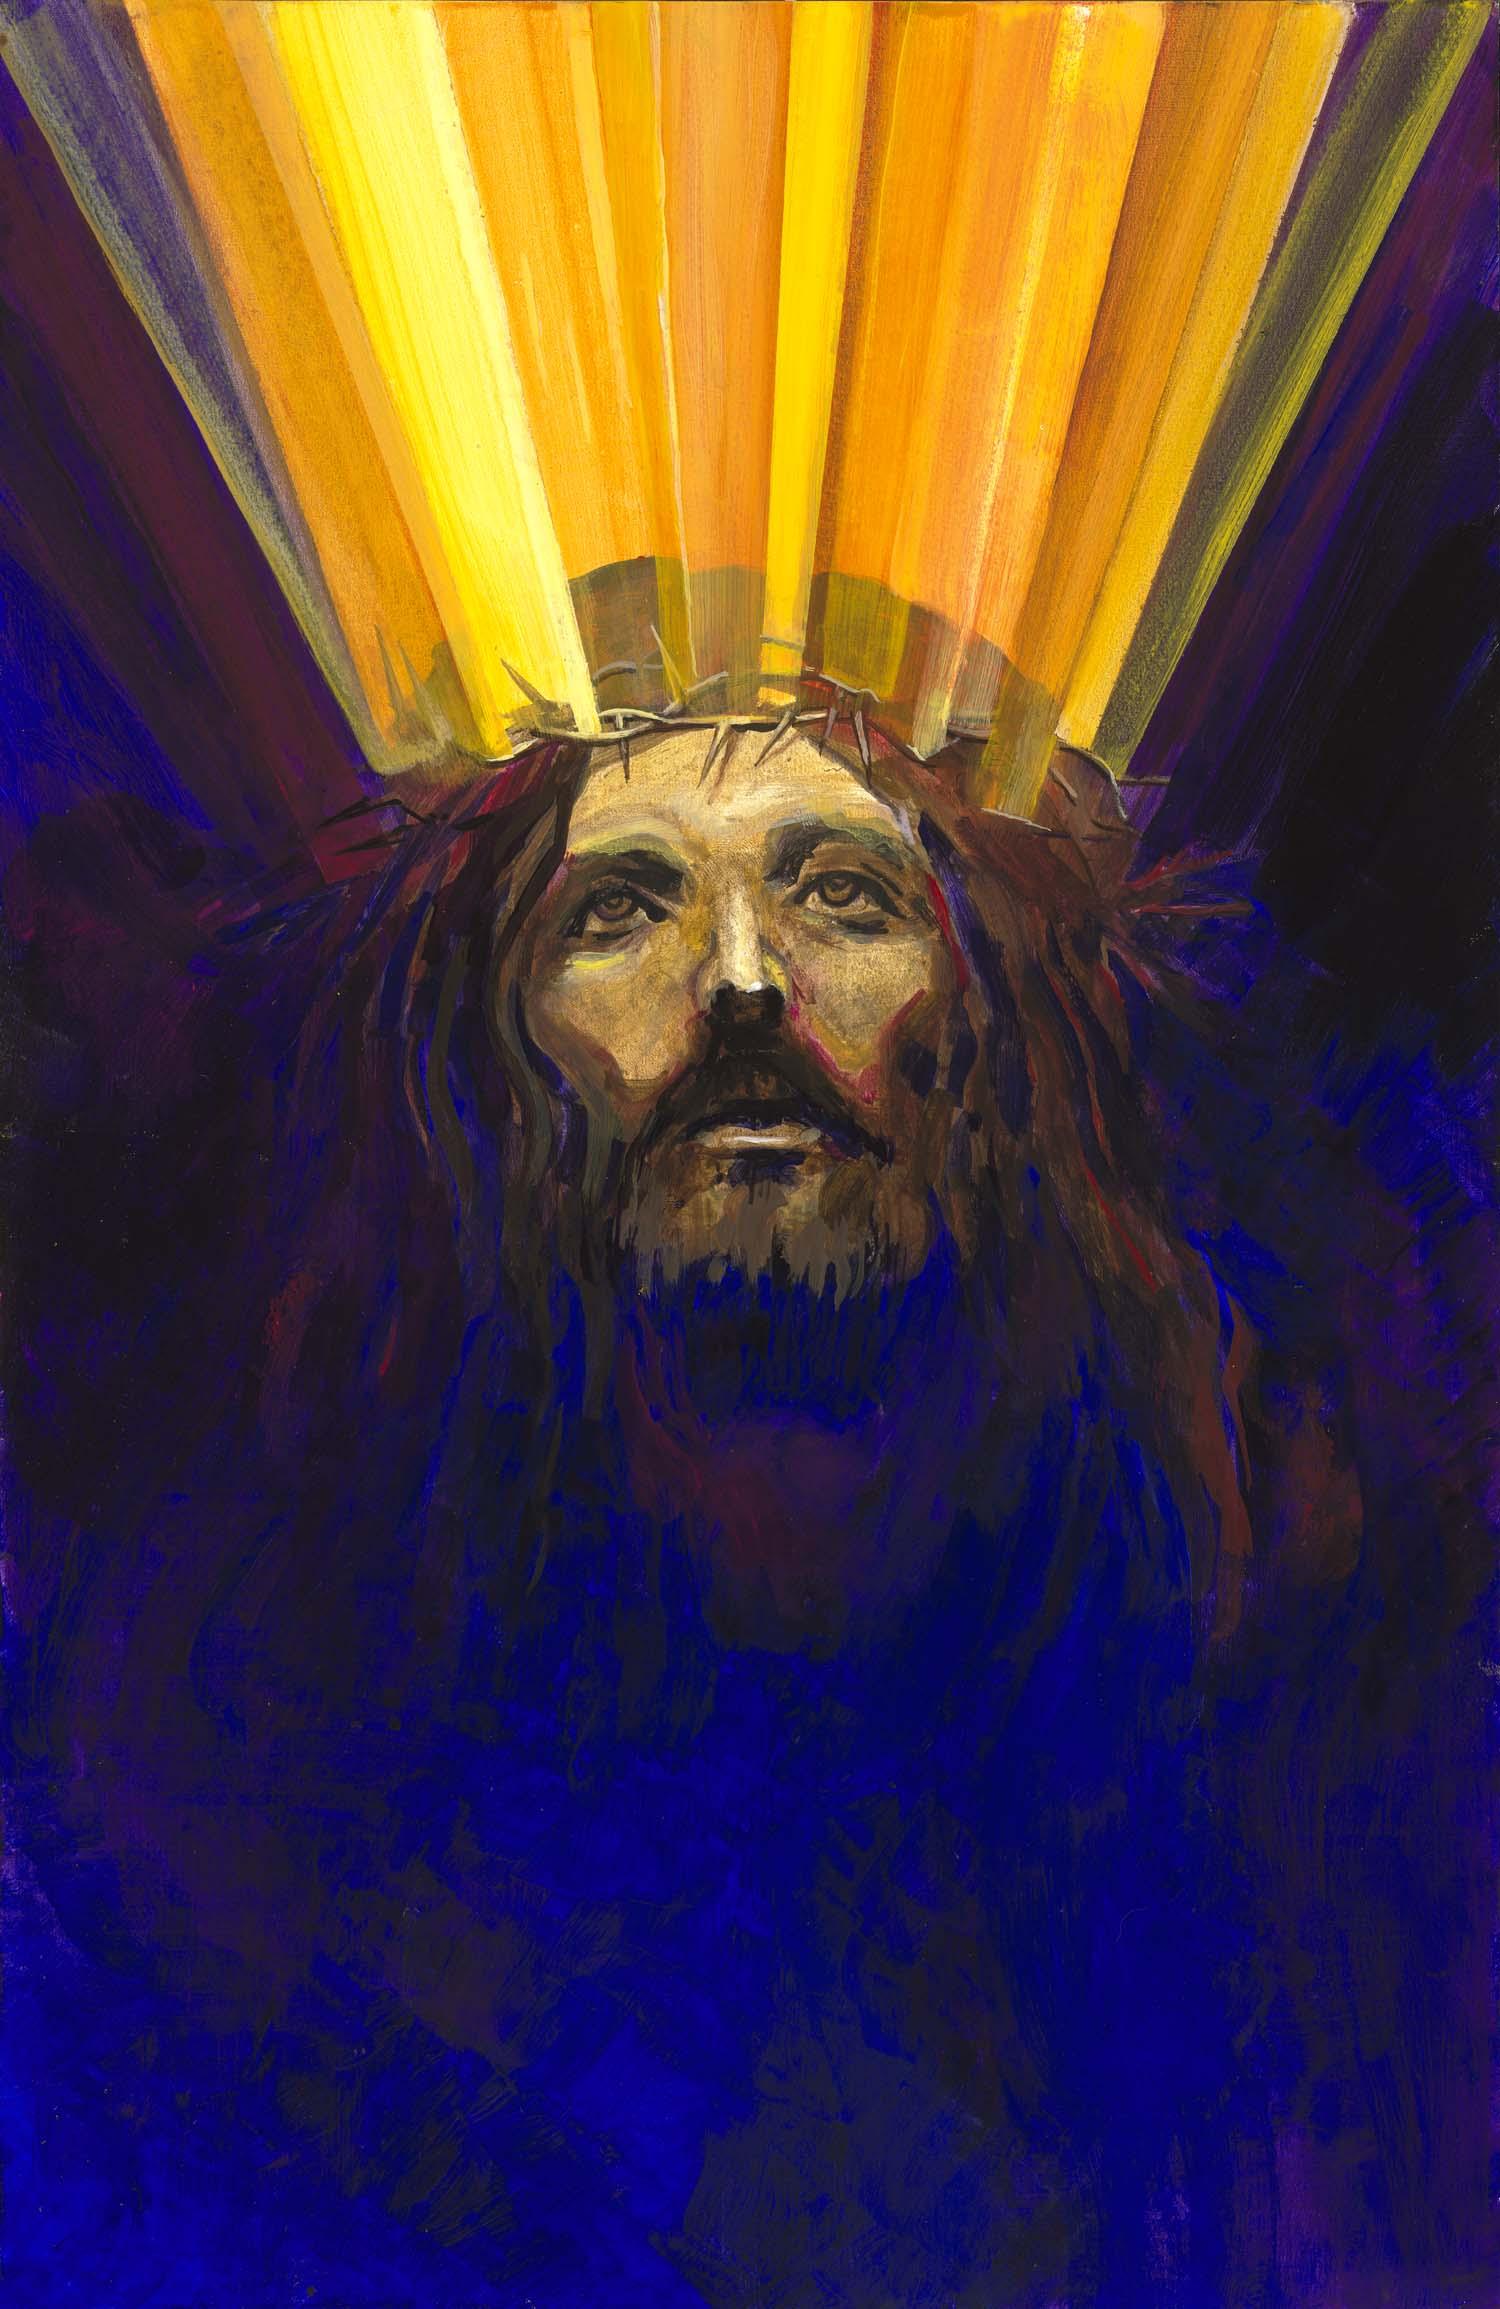 Christ the King © 2013 SLS, Inc.